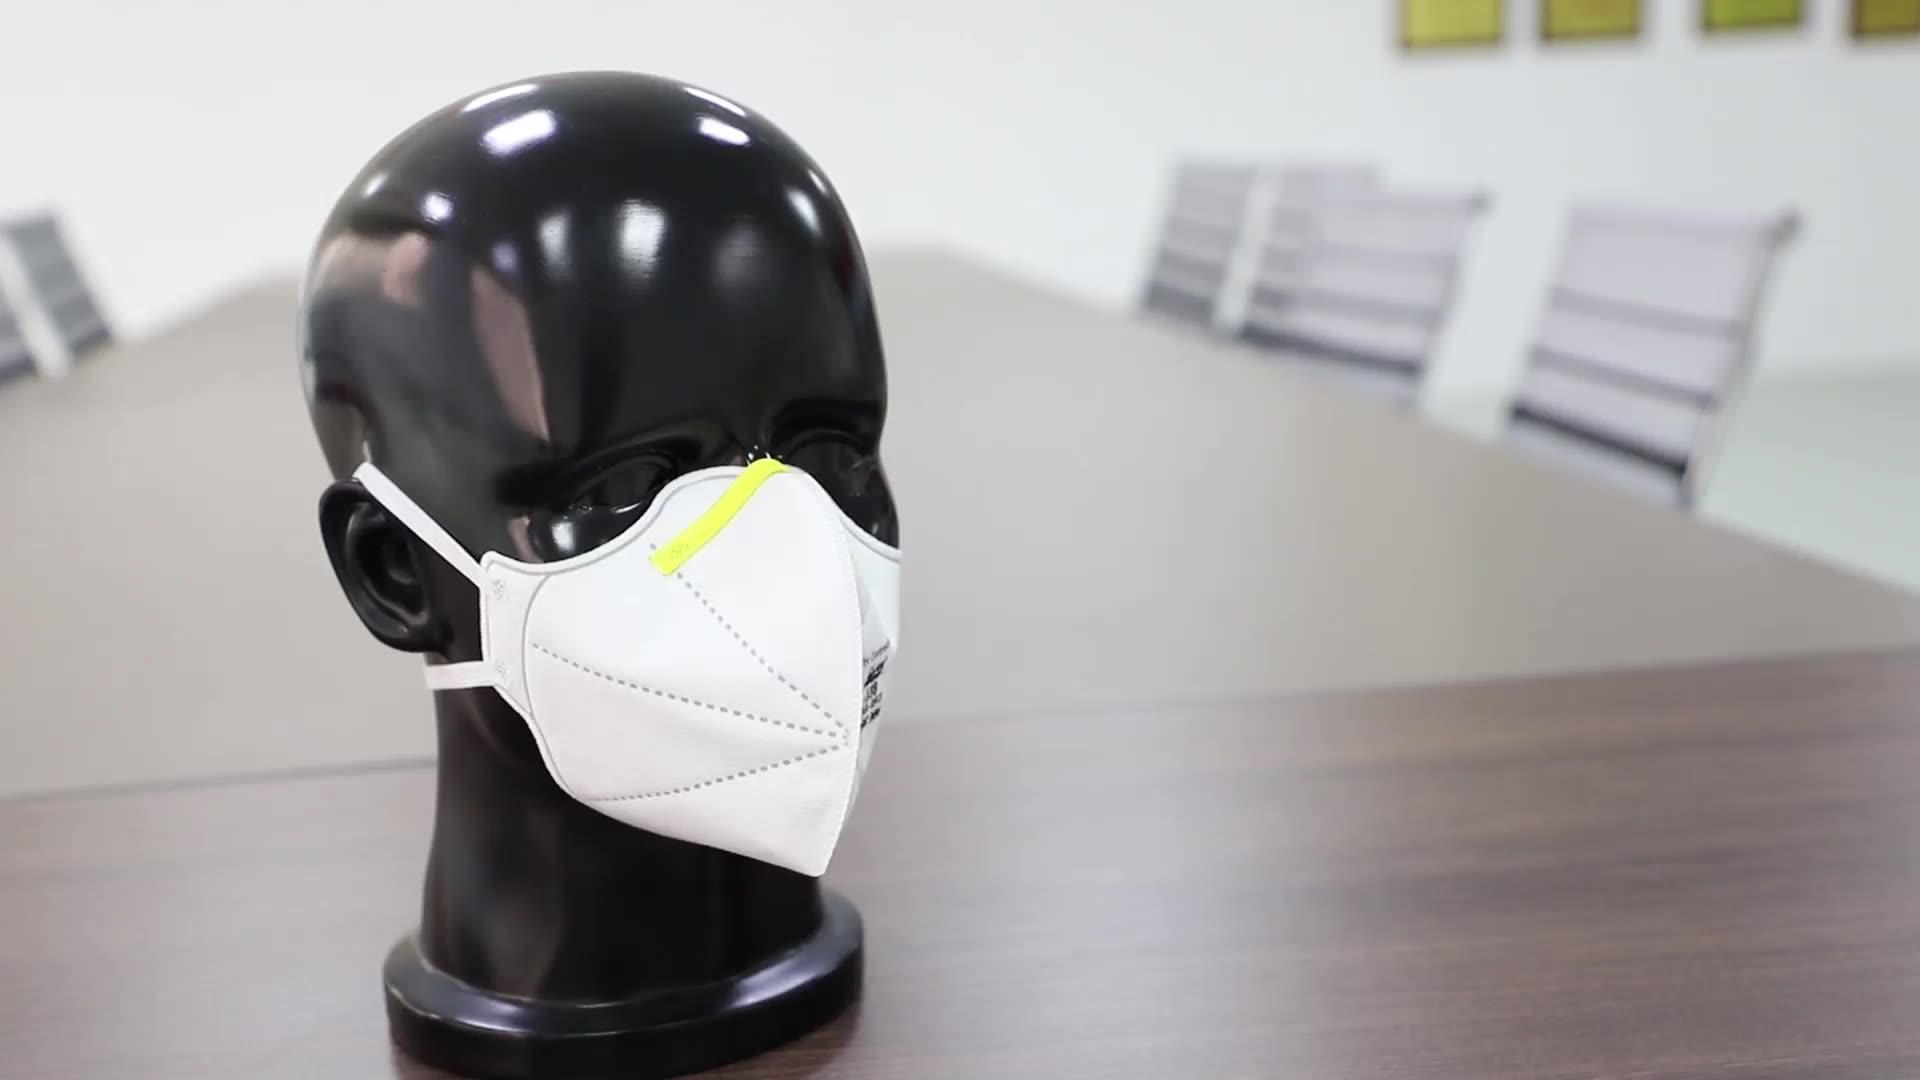 NIOSH N95 Disposable 3ply Safety Half Filter Face Pollution Respirator Mask